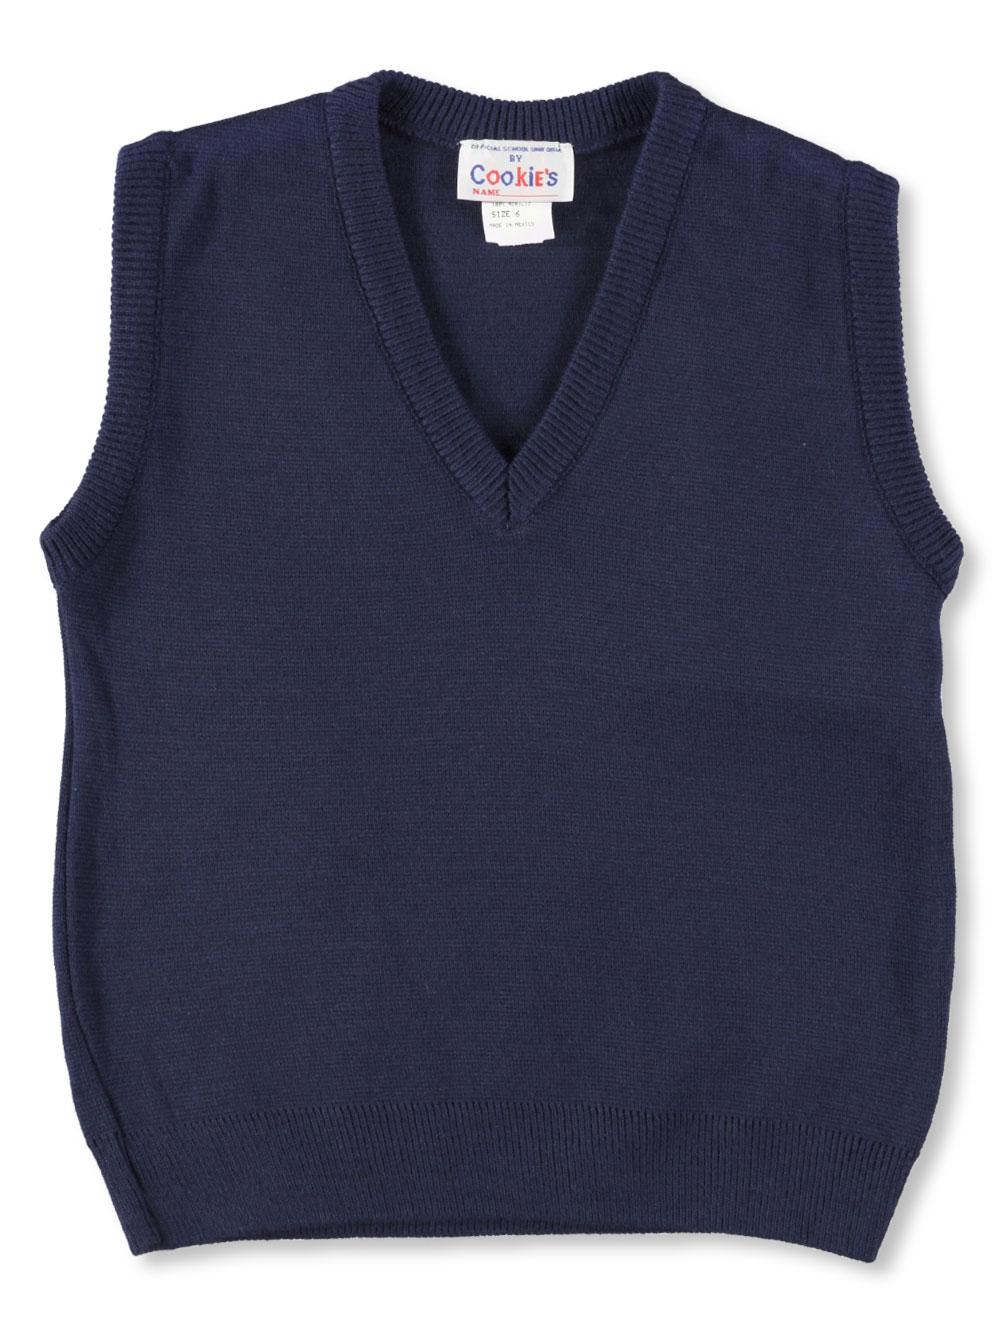 Girls Cookie's Brand Unisex V-Neck Sweater Vest (Sizes 4 - 7)